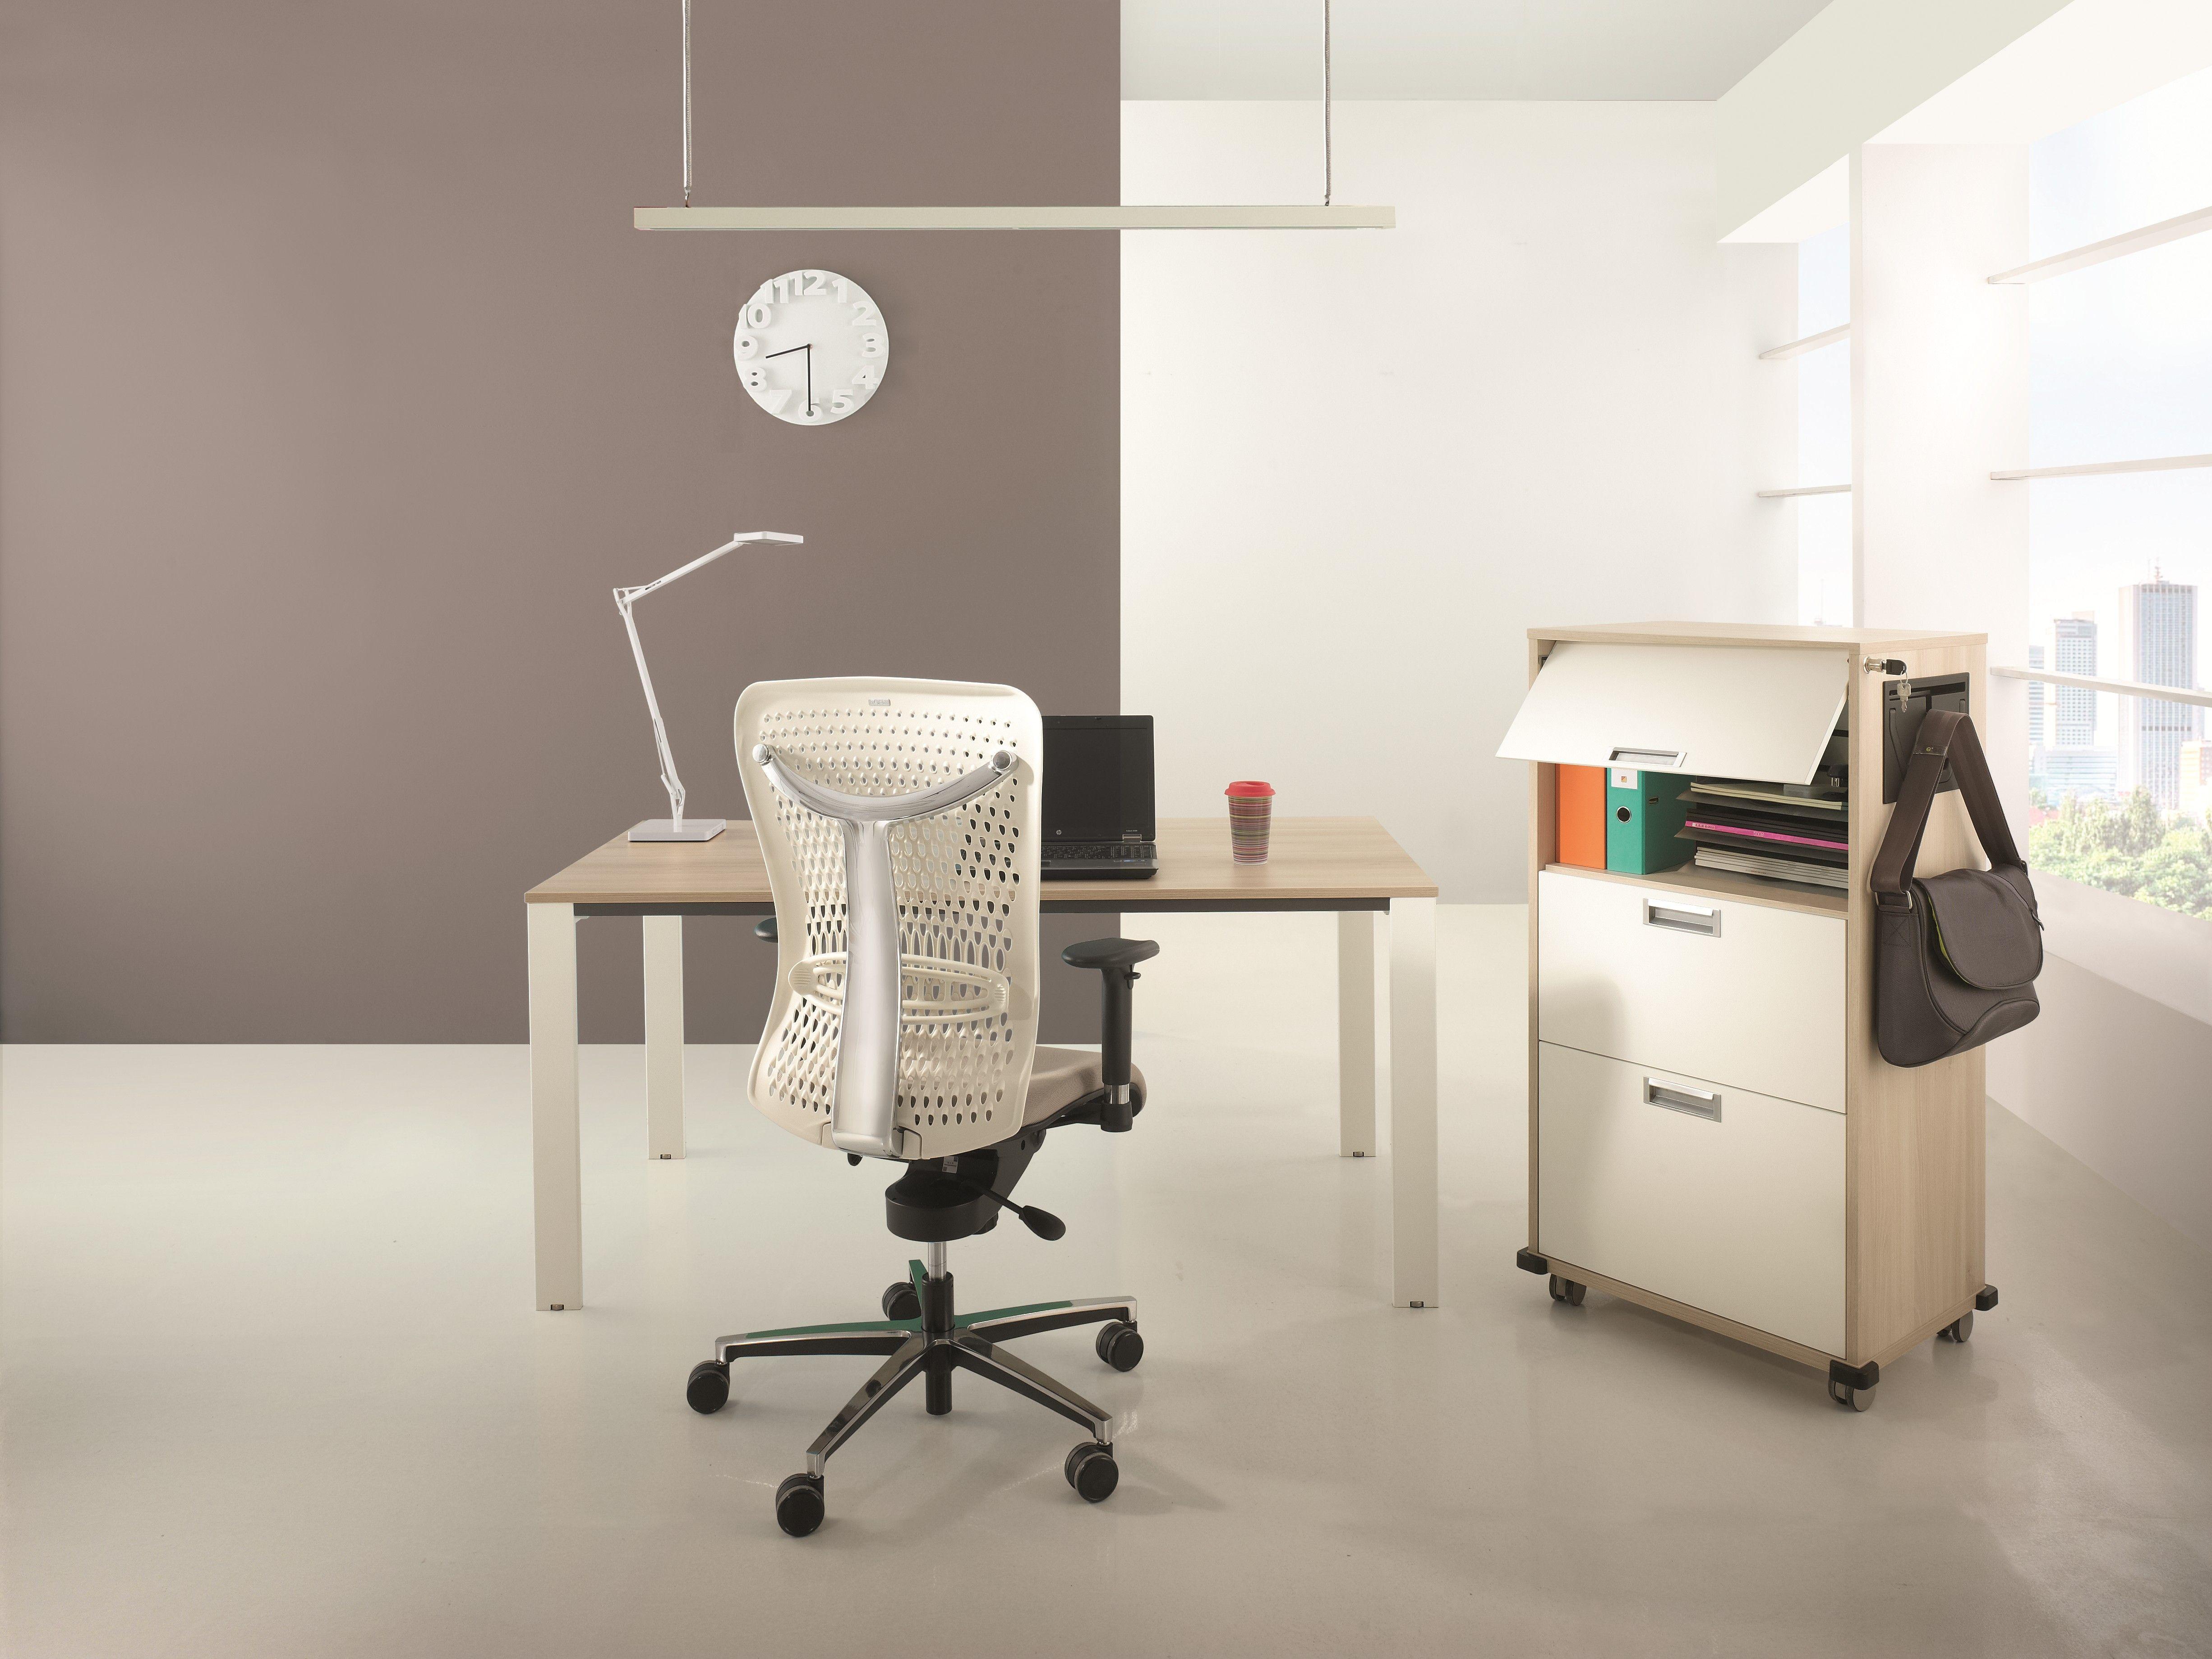 Mikomax Kubik kast ladeblok werkplek bureau